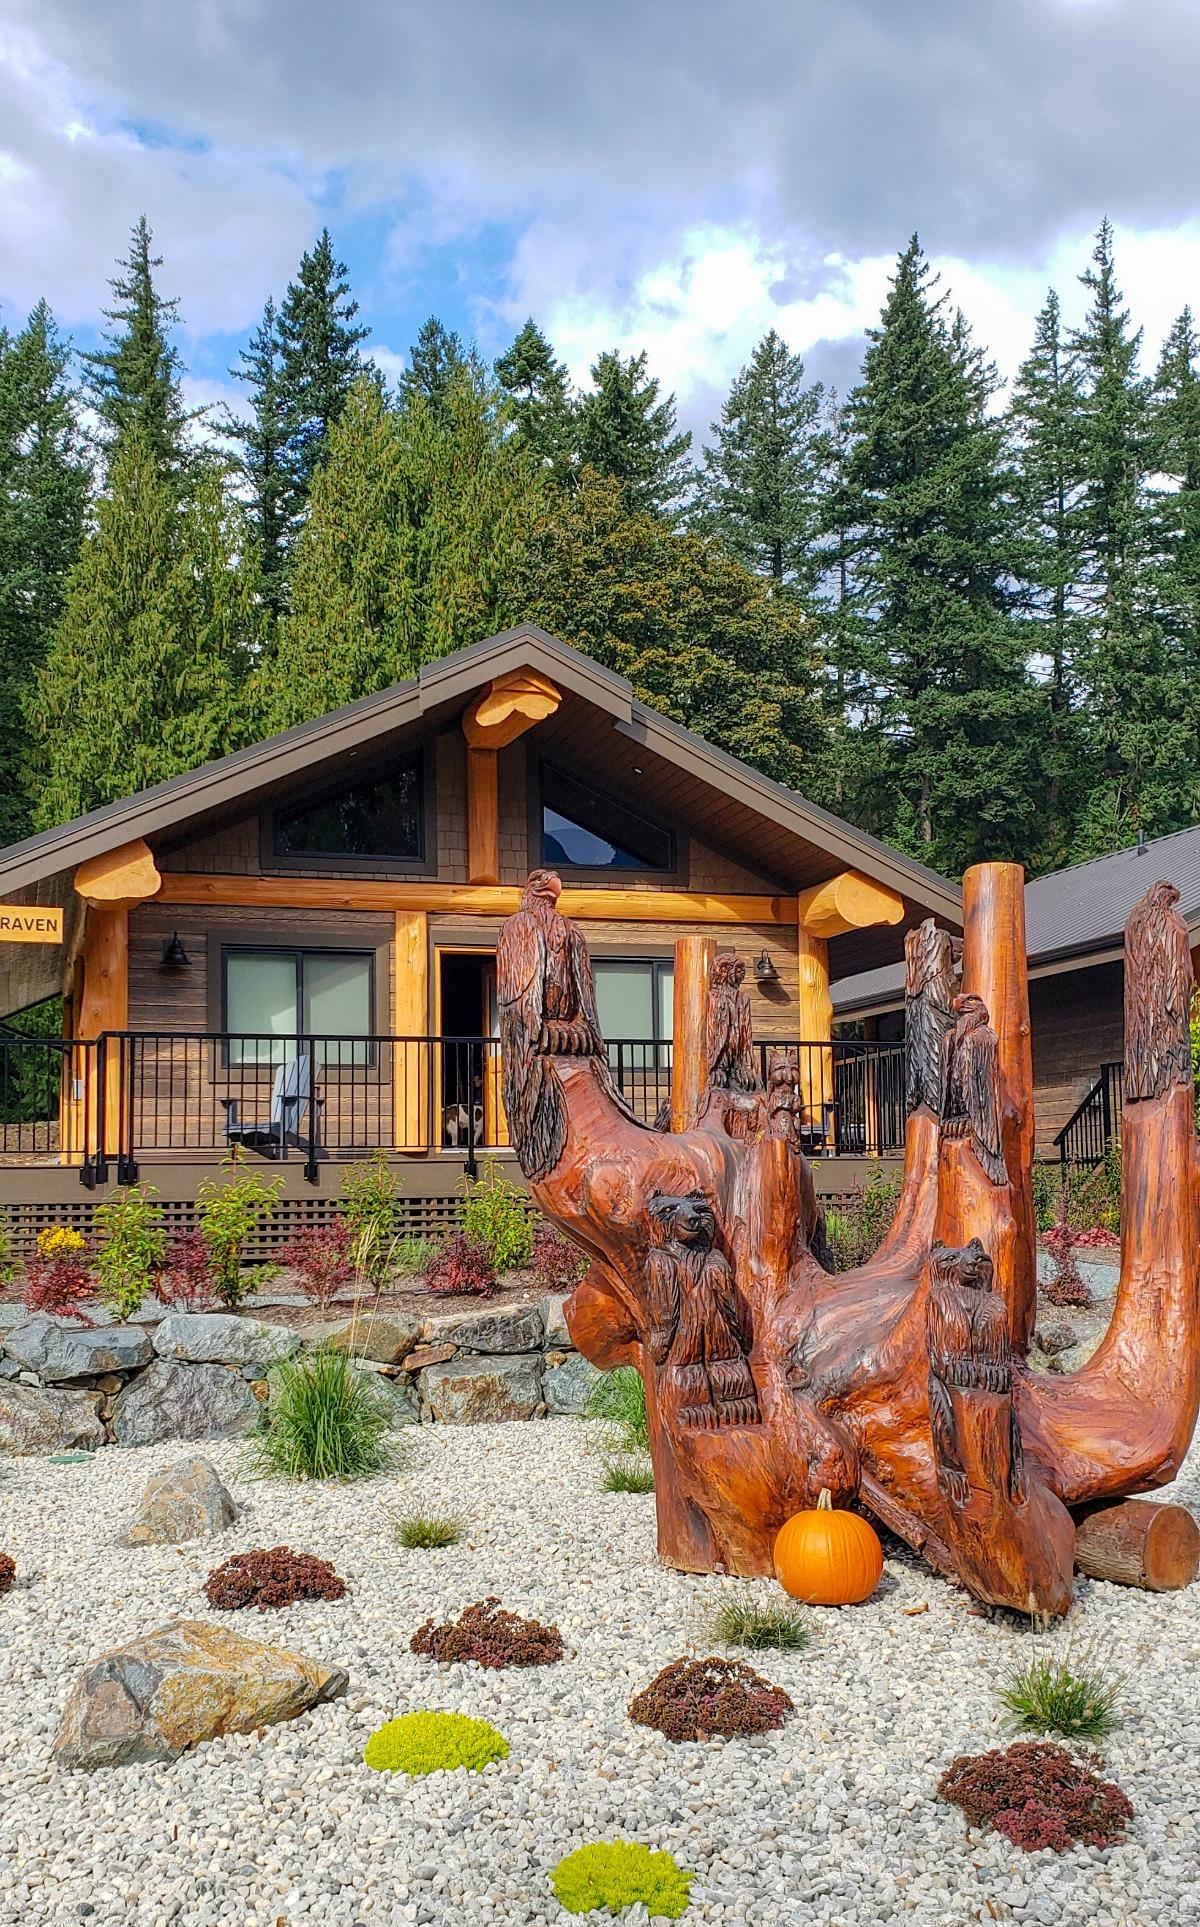 Osprey cabins at Sandpiper resort